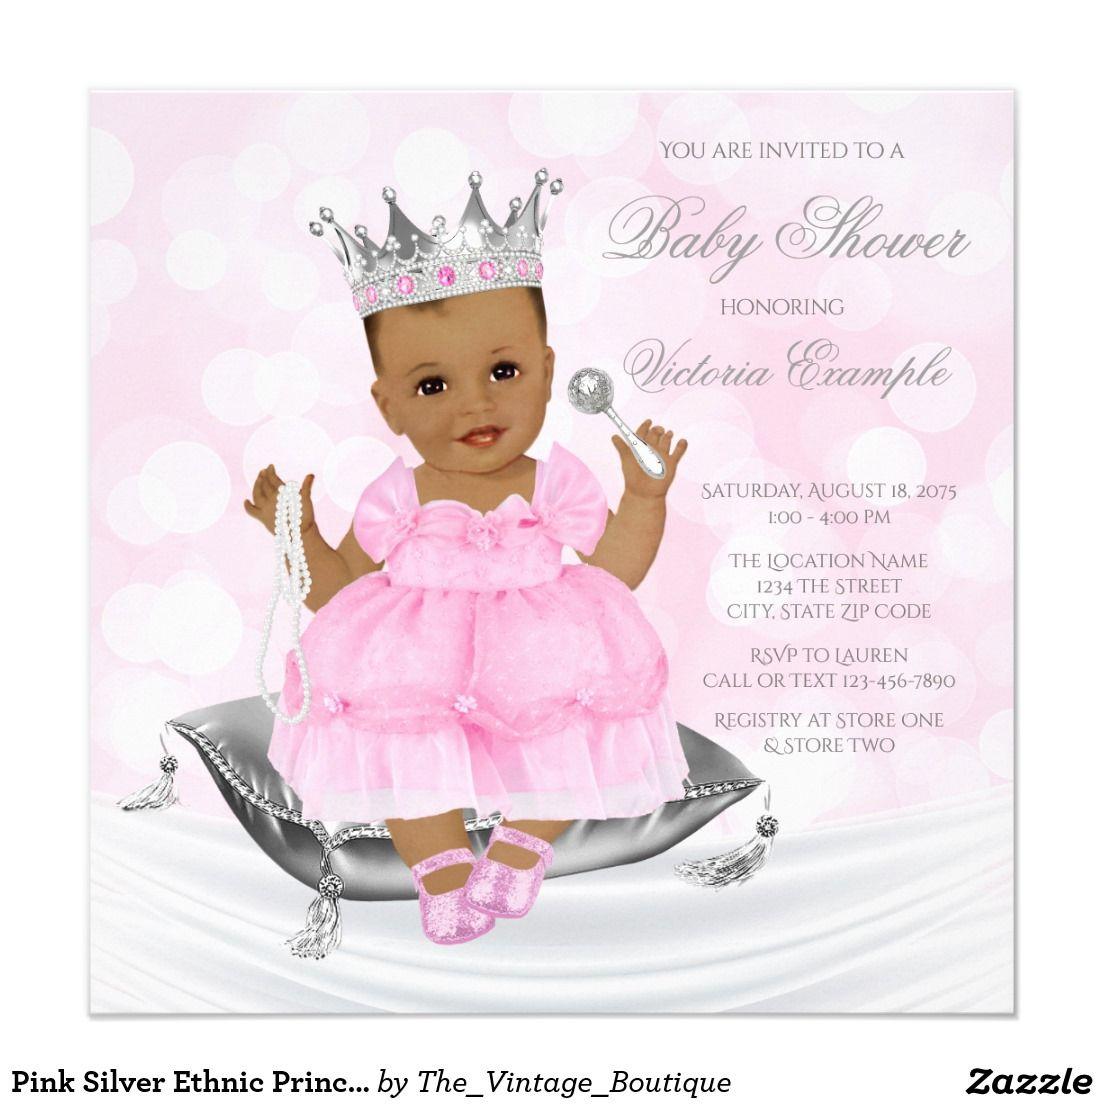 Pink Silver Ethnic Princess Baby Shower Invitation   Ethnic Girl ...